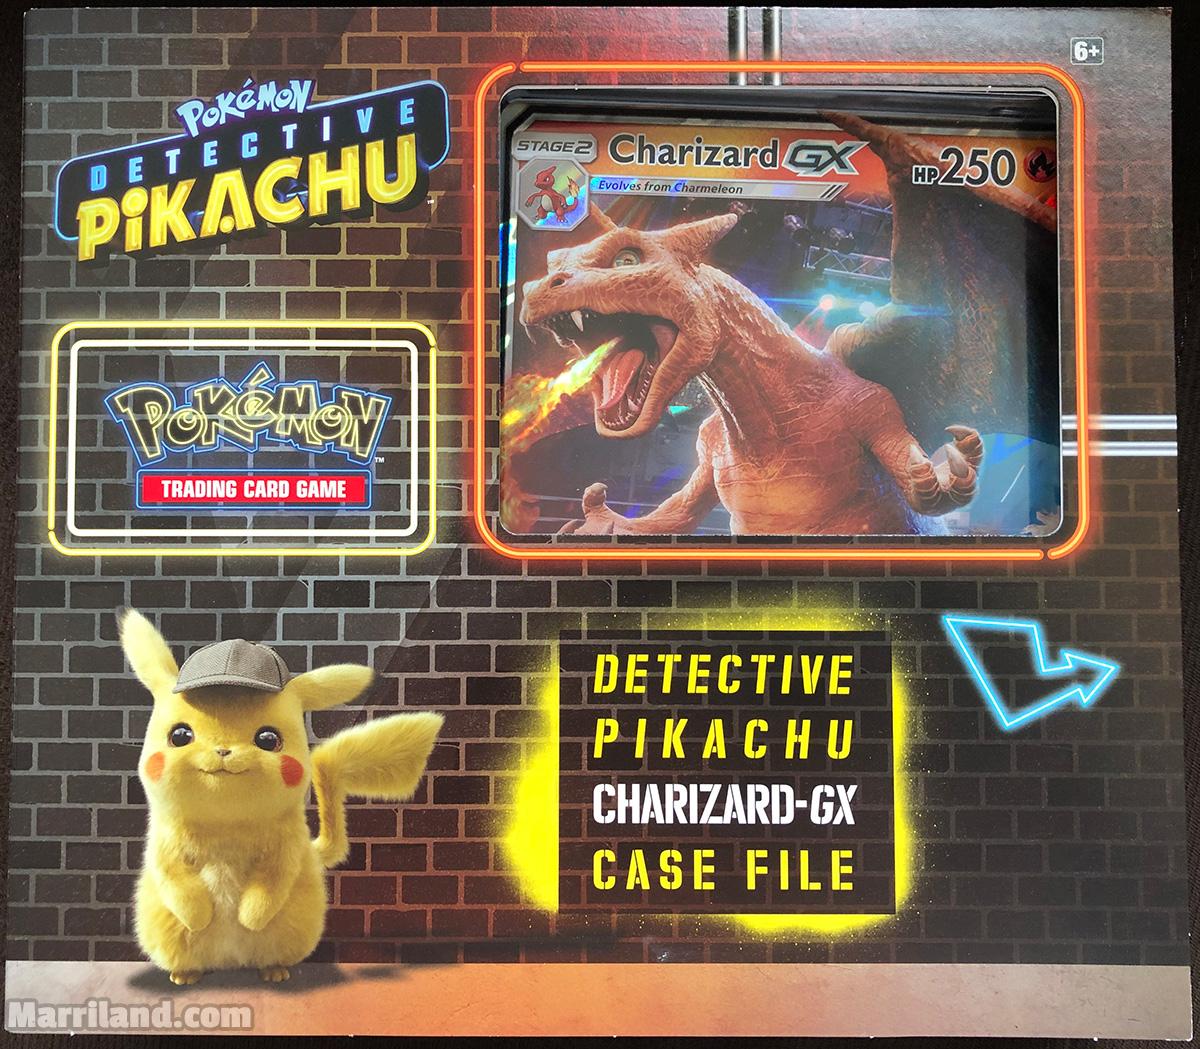 Pokemon Tcg Detective Pikachu Charizard Gx Case File Review Marriland Com